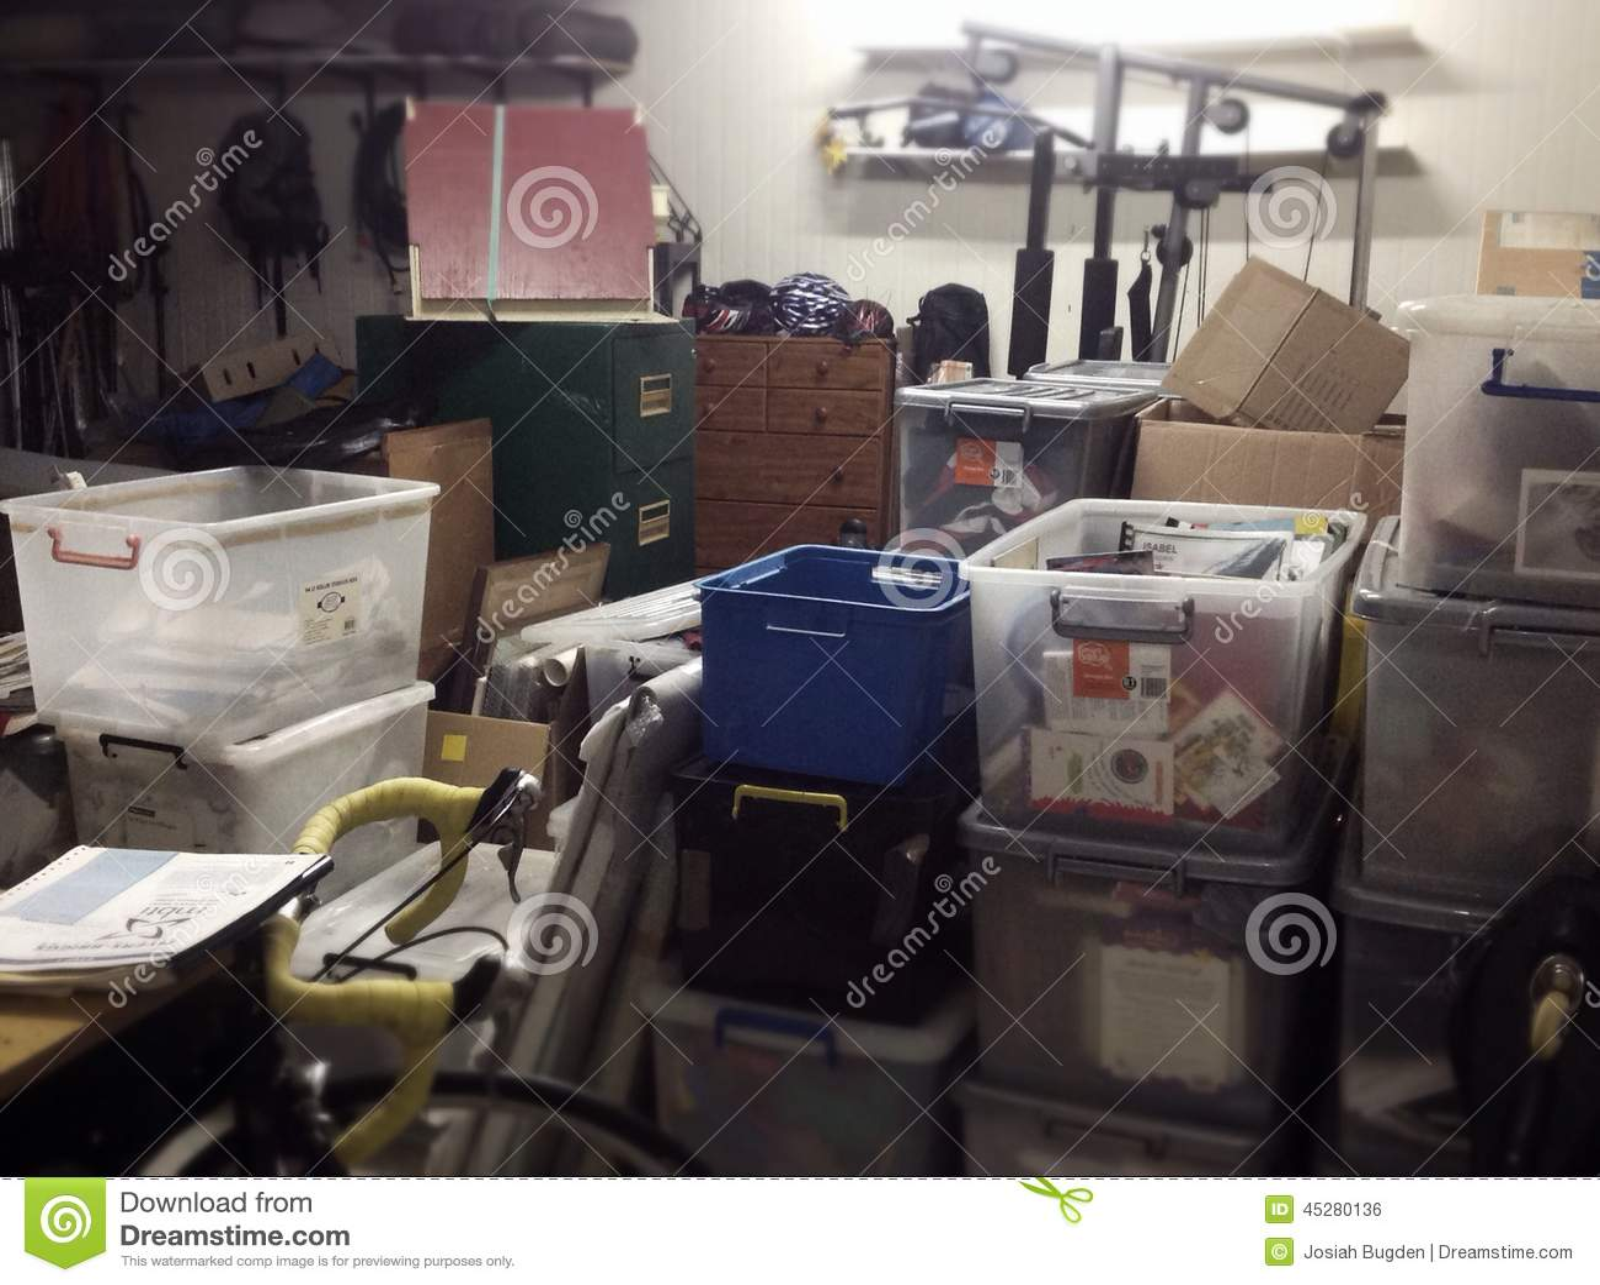 Full Messy Storage Shed Stock Photo Image 45280136